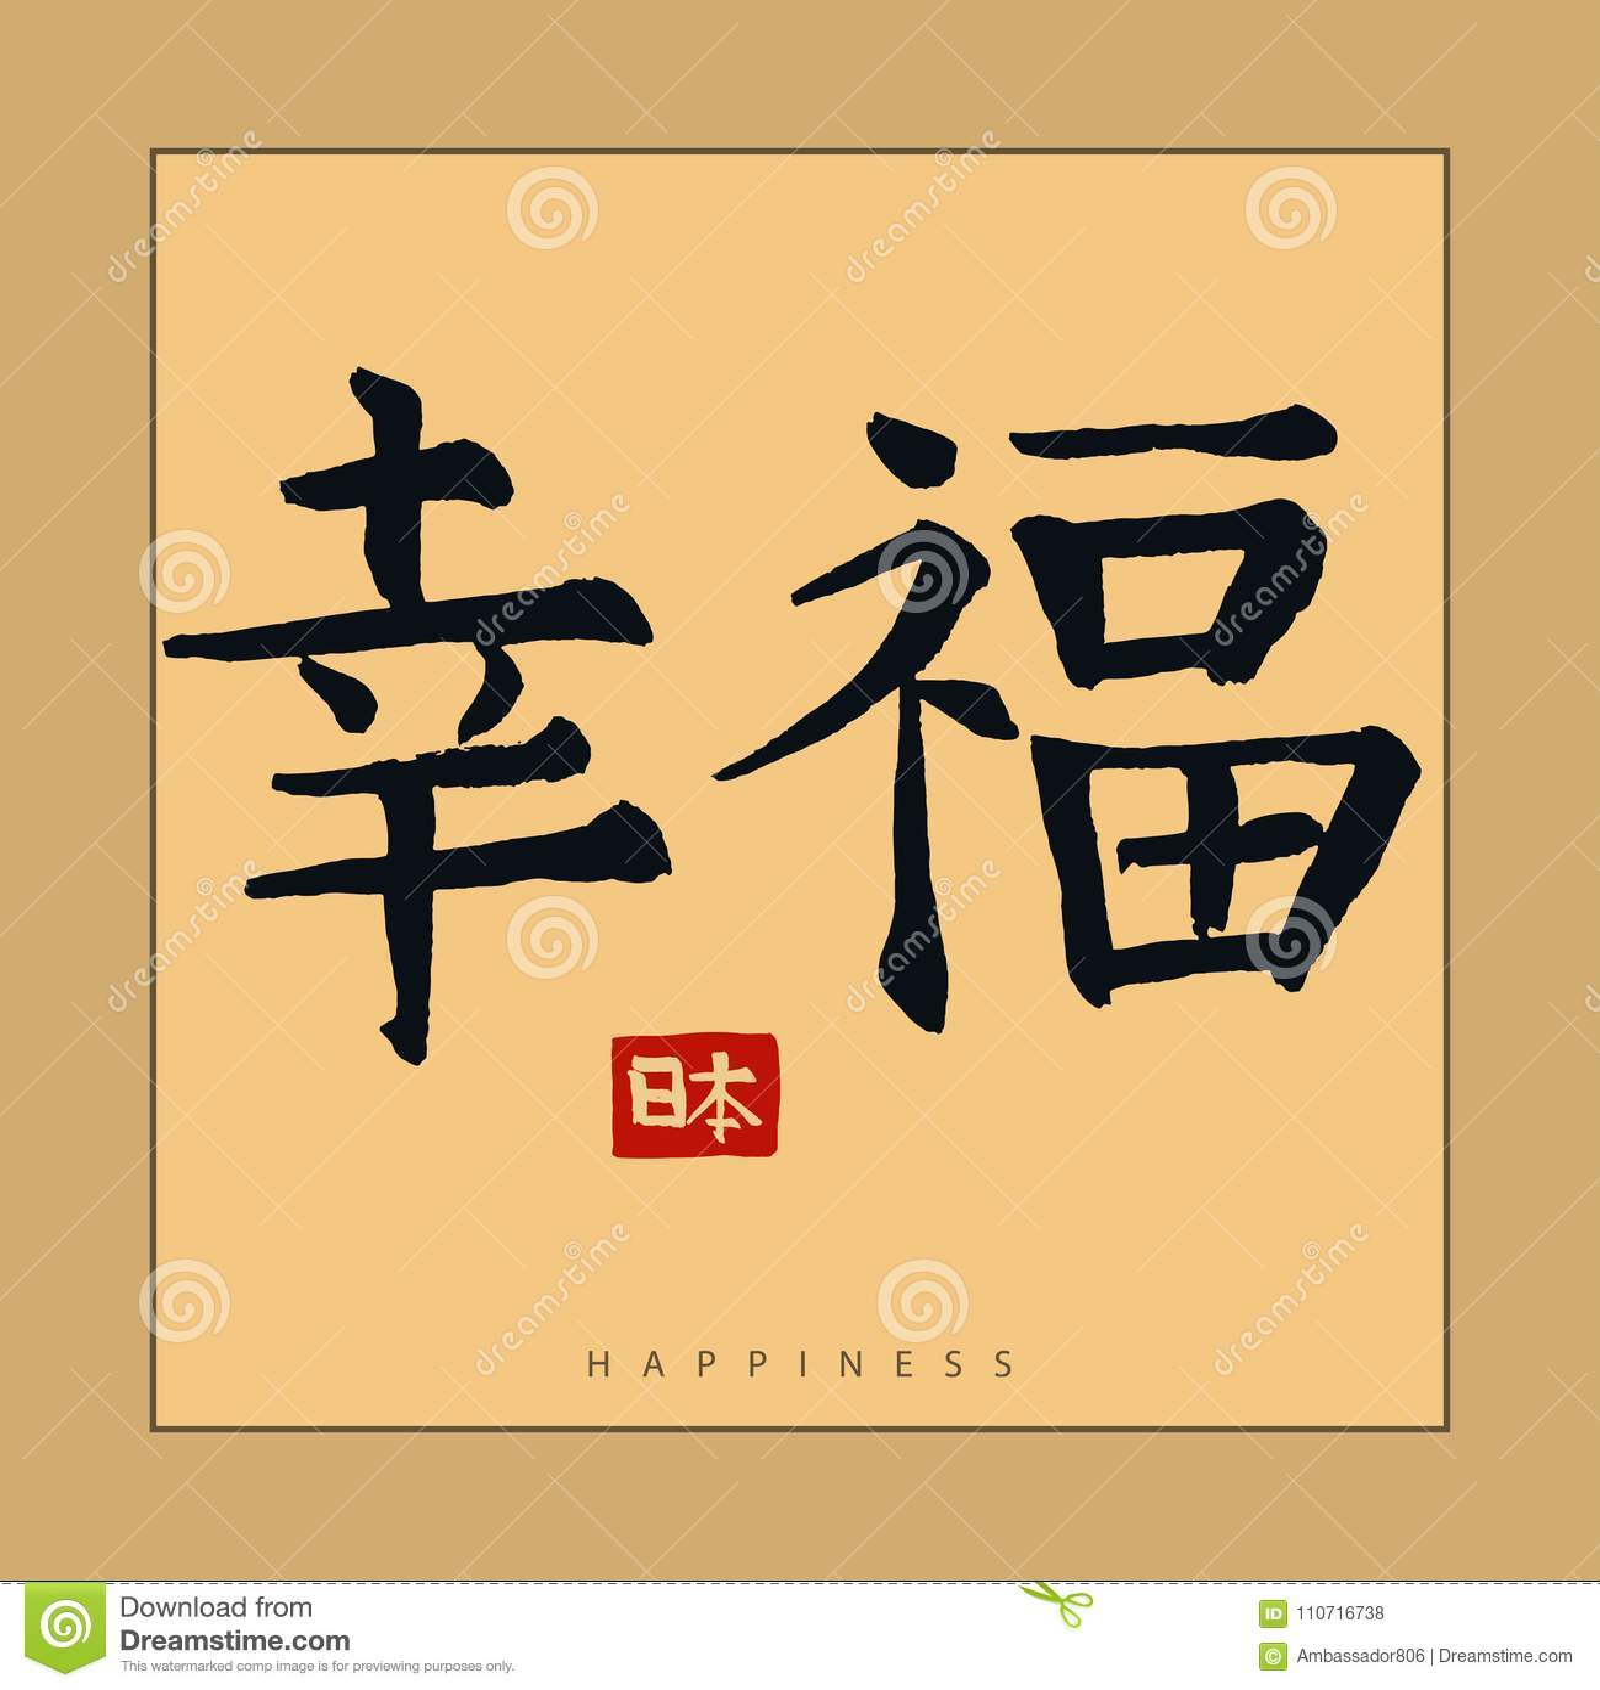 Japan Happiness Hieroglyph Hand Drawn Japanese Calligraphy Vector